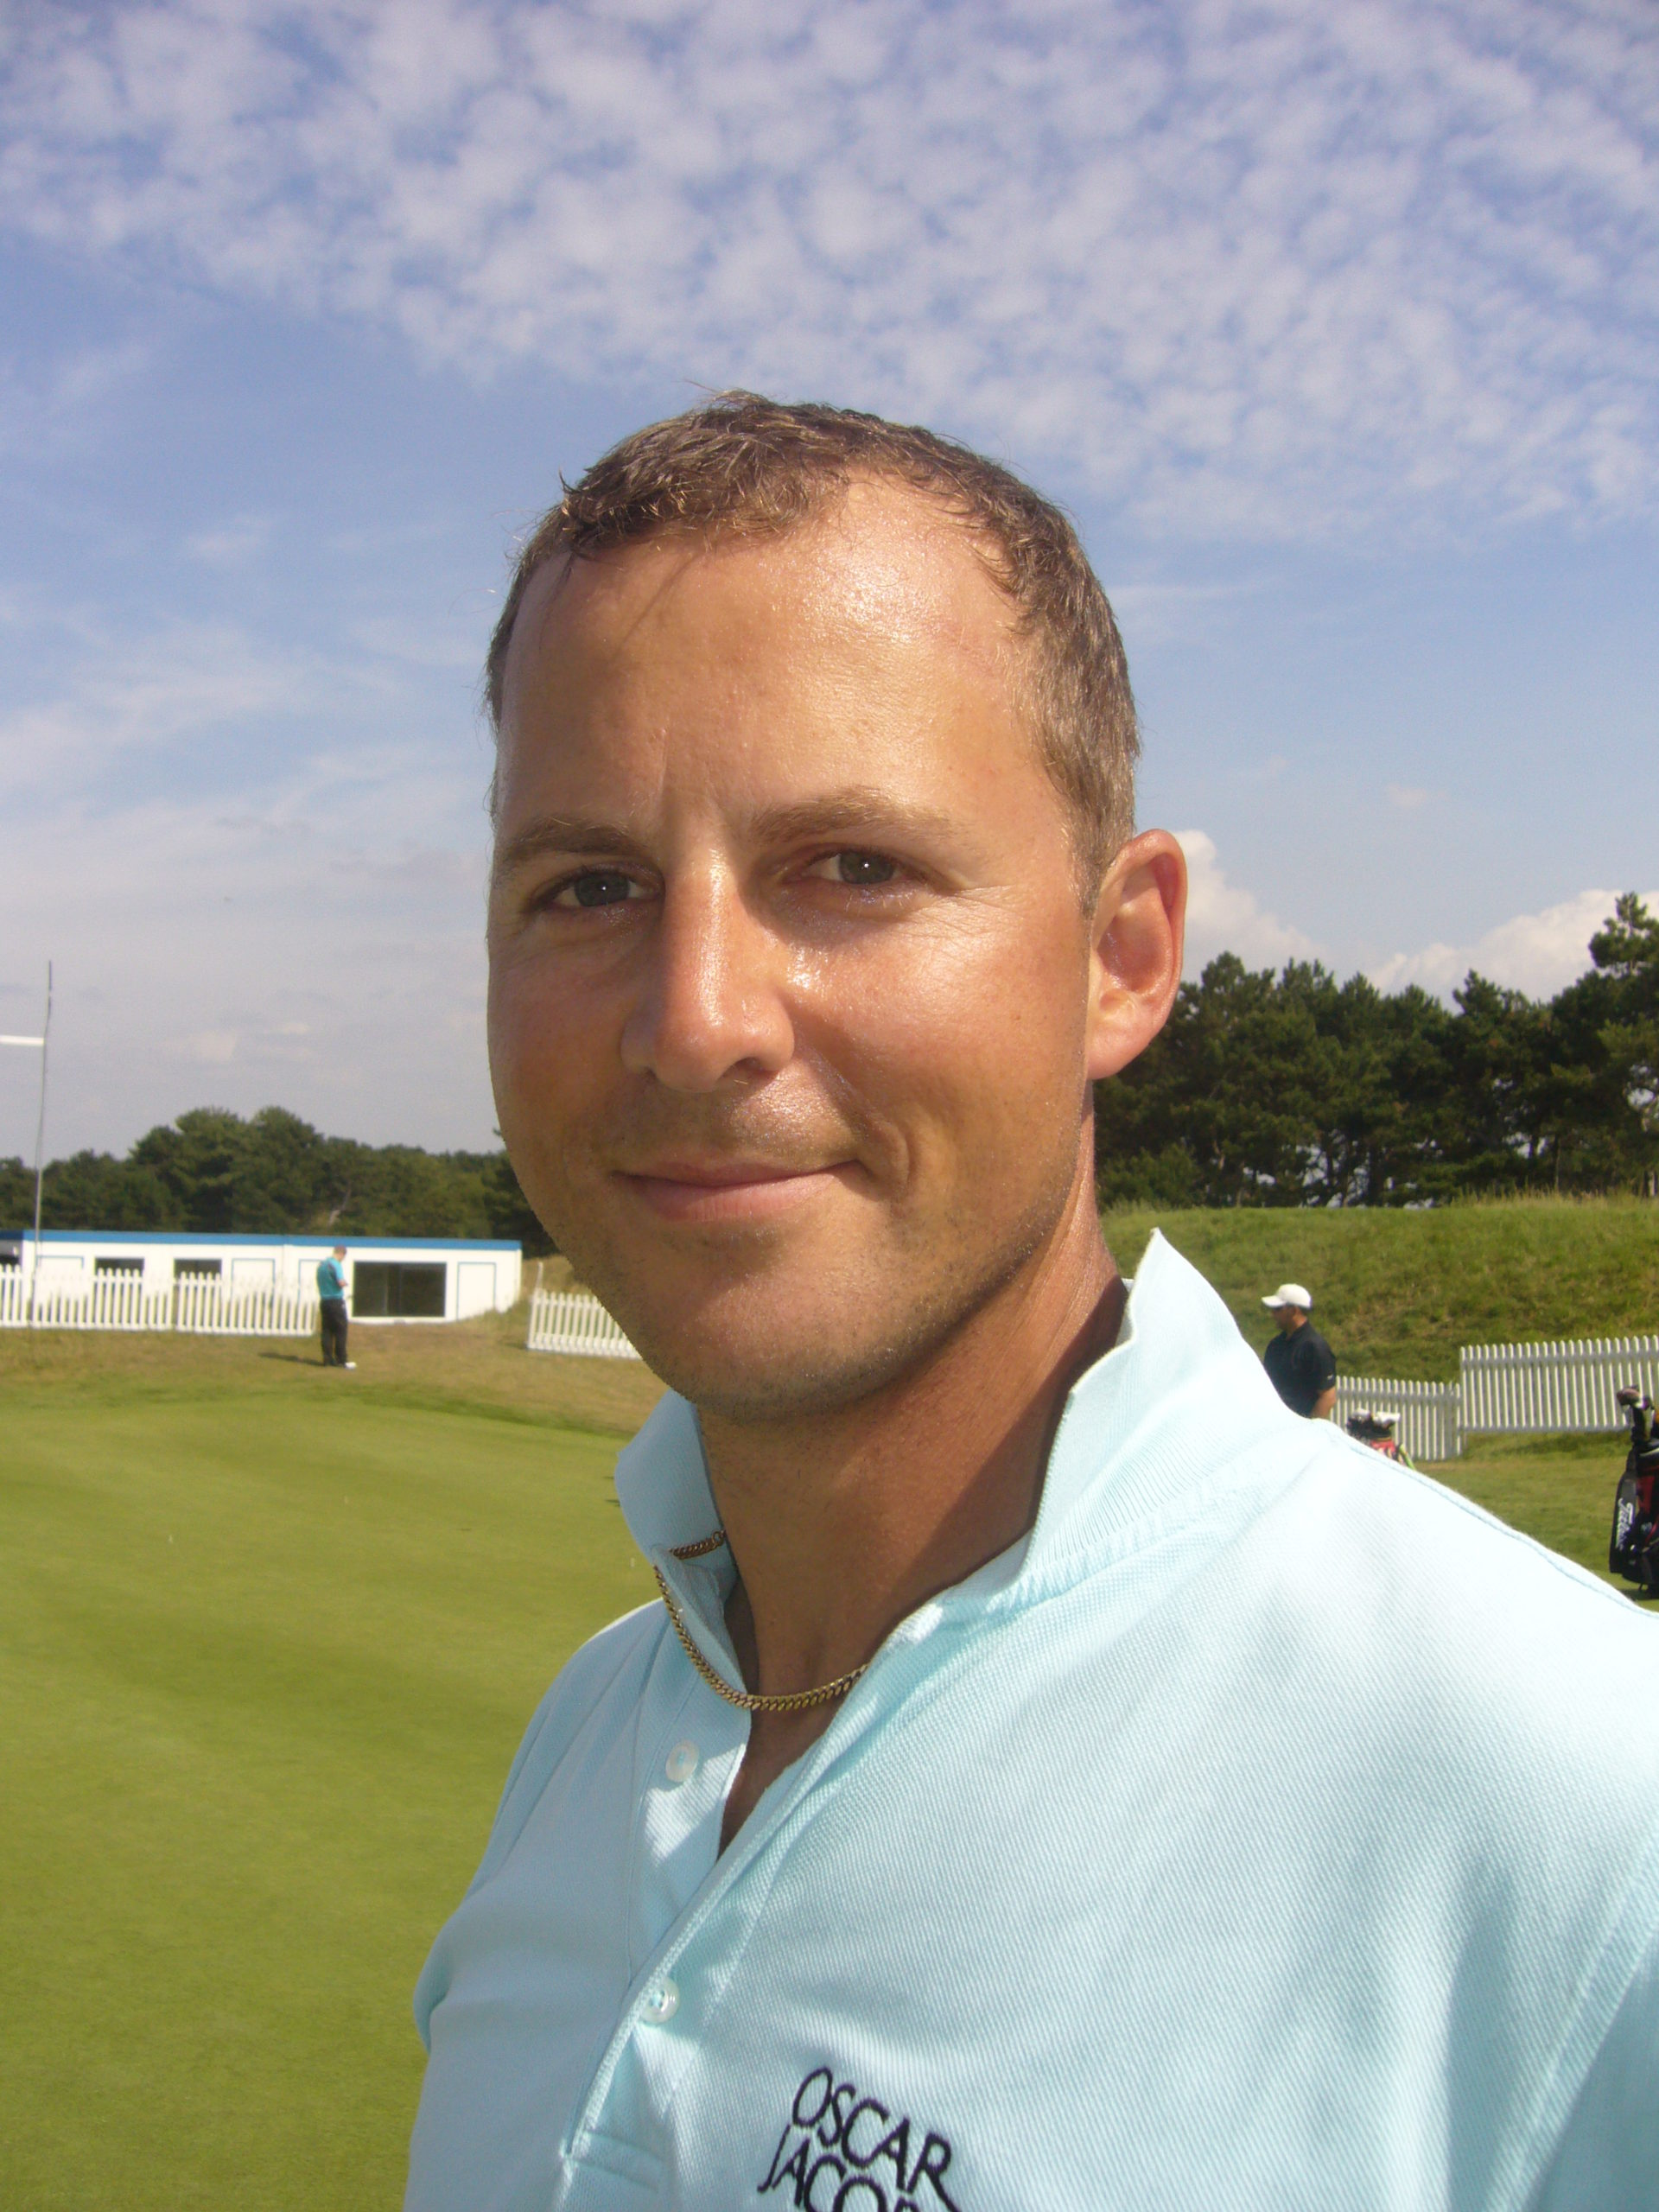 Swedish professional golfers